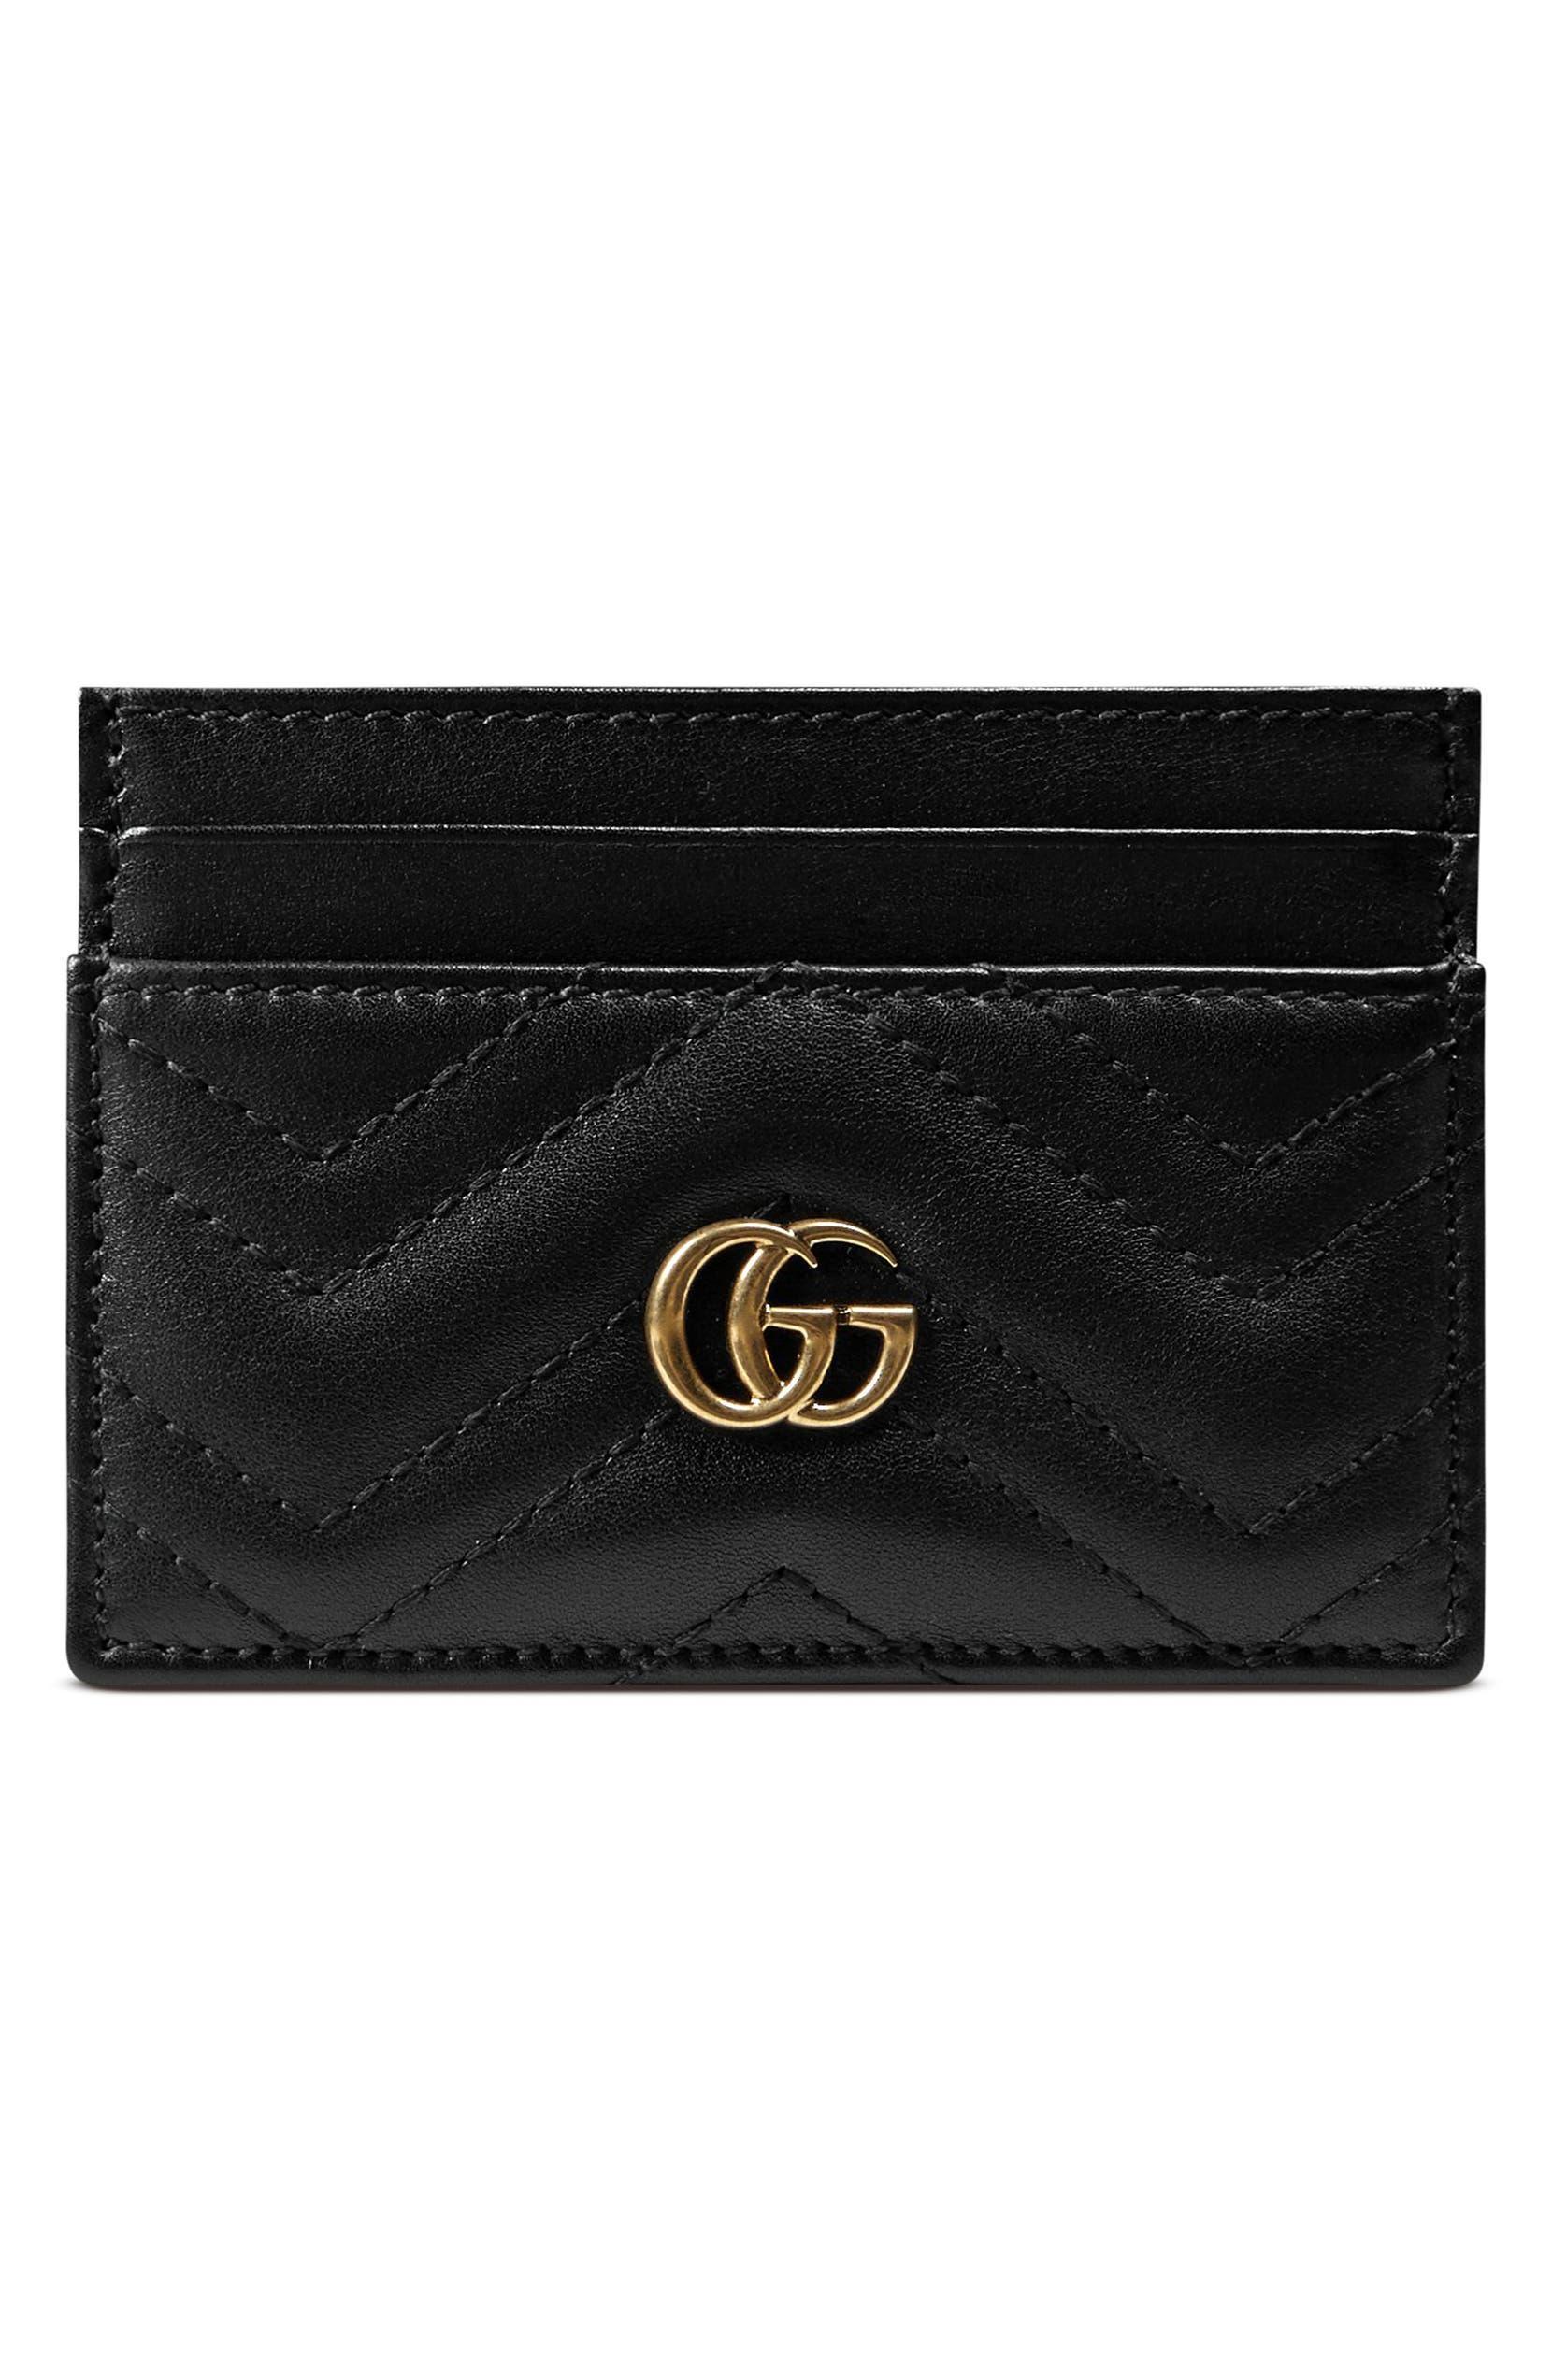 9681f0f3e0338 Gucci GG Marmont Matelassé Leather Card Case | Nordstrom